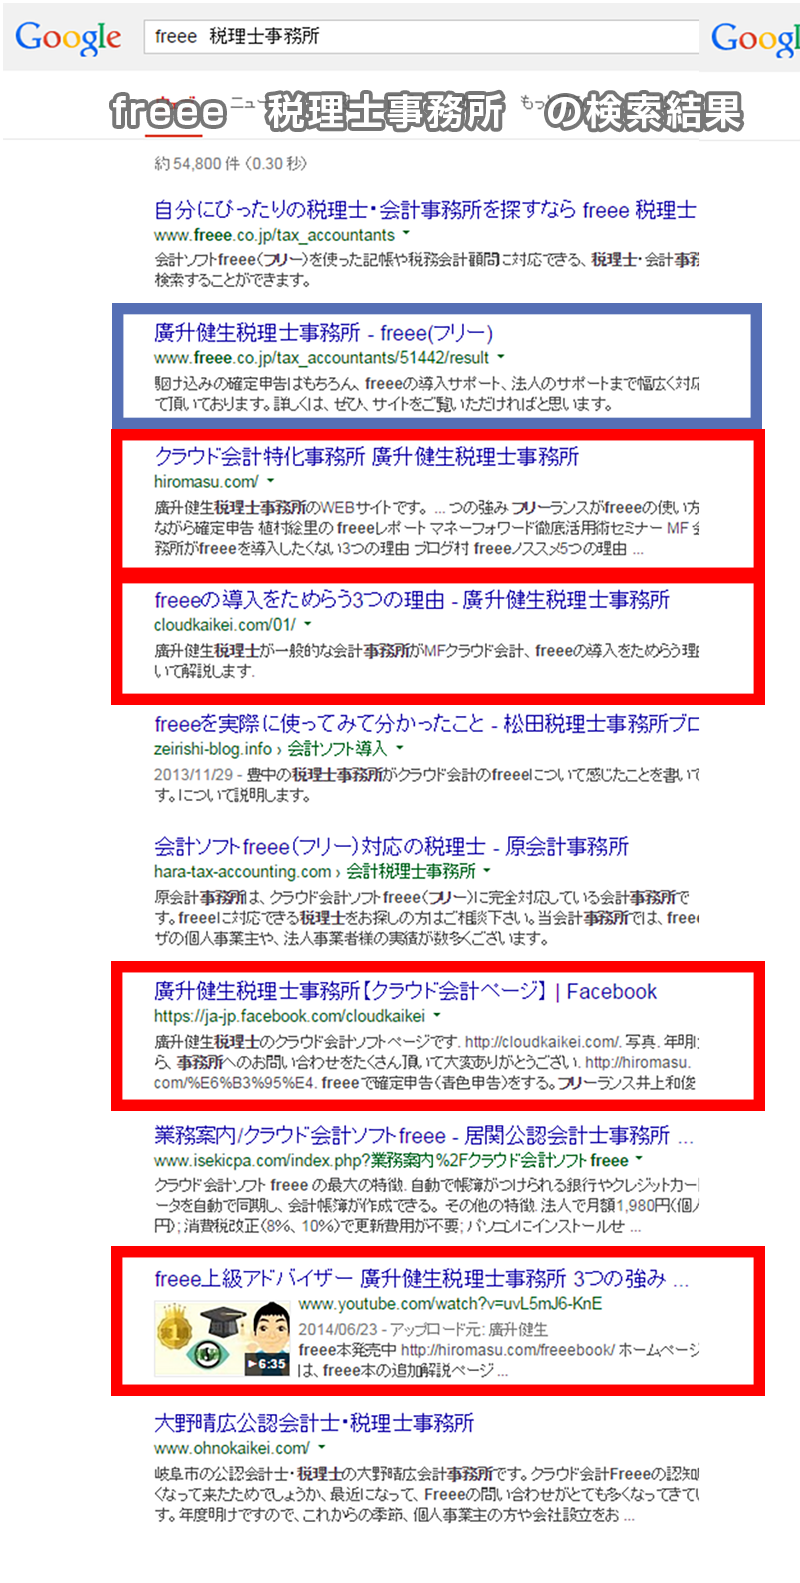 freee税理士事務所検索結果